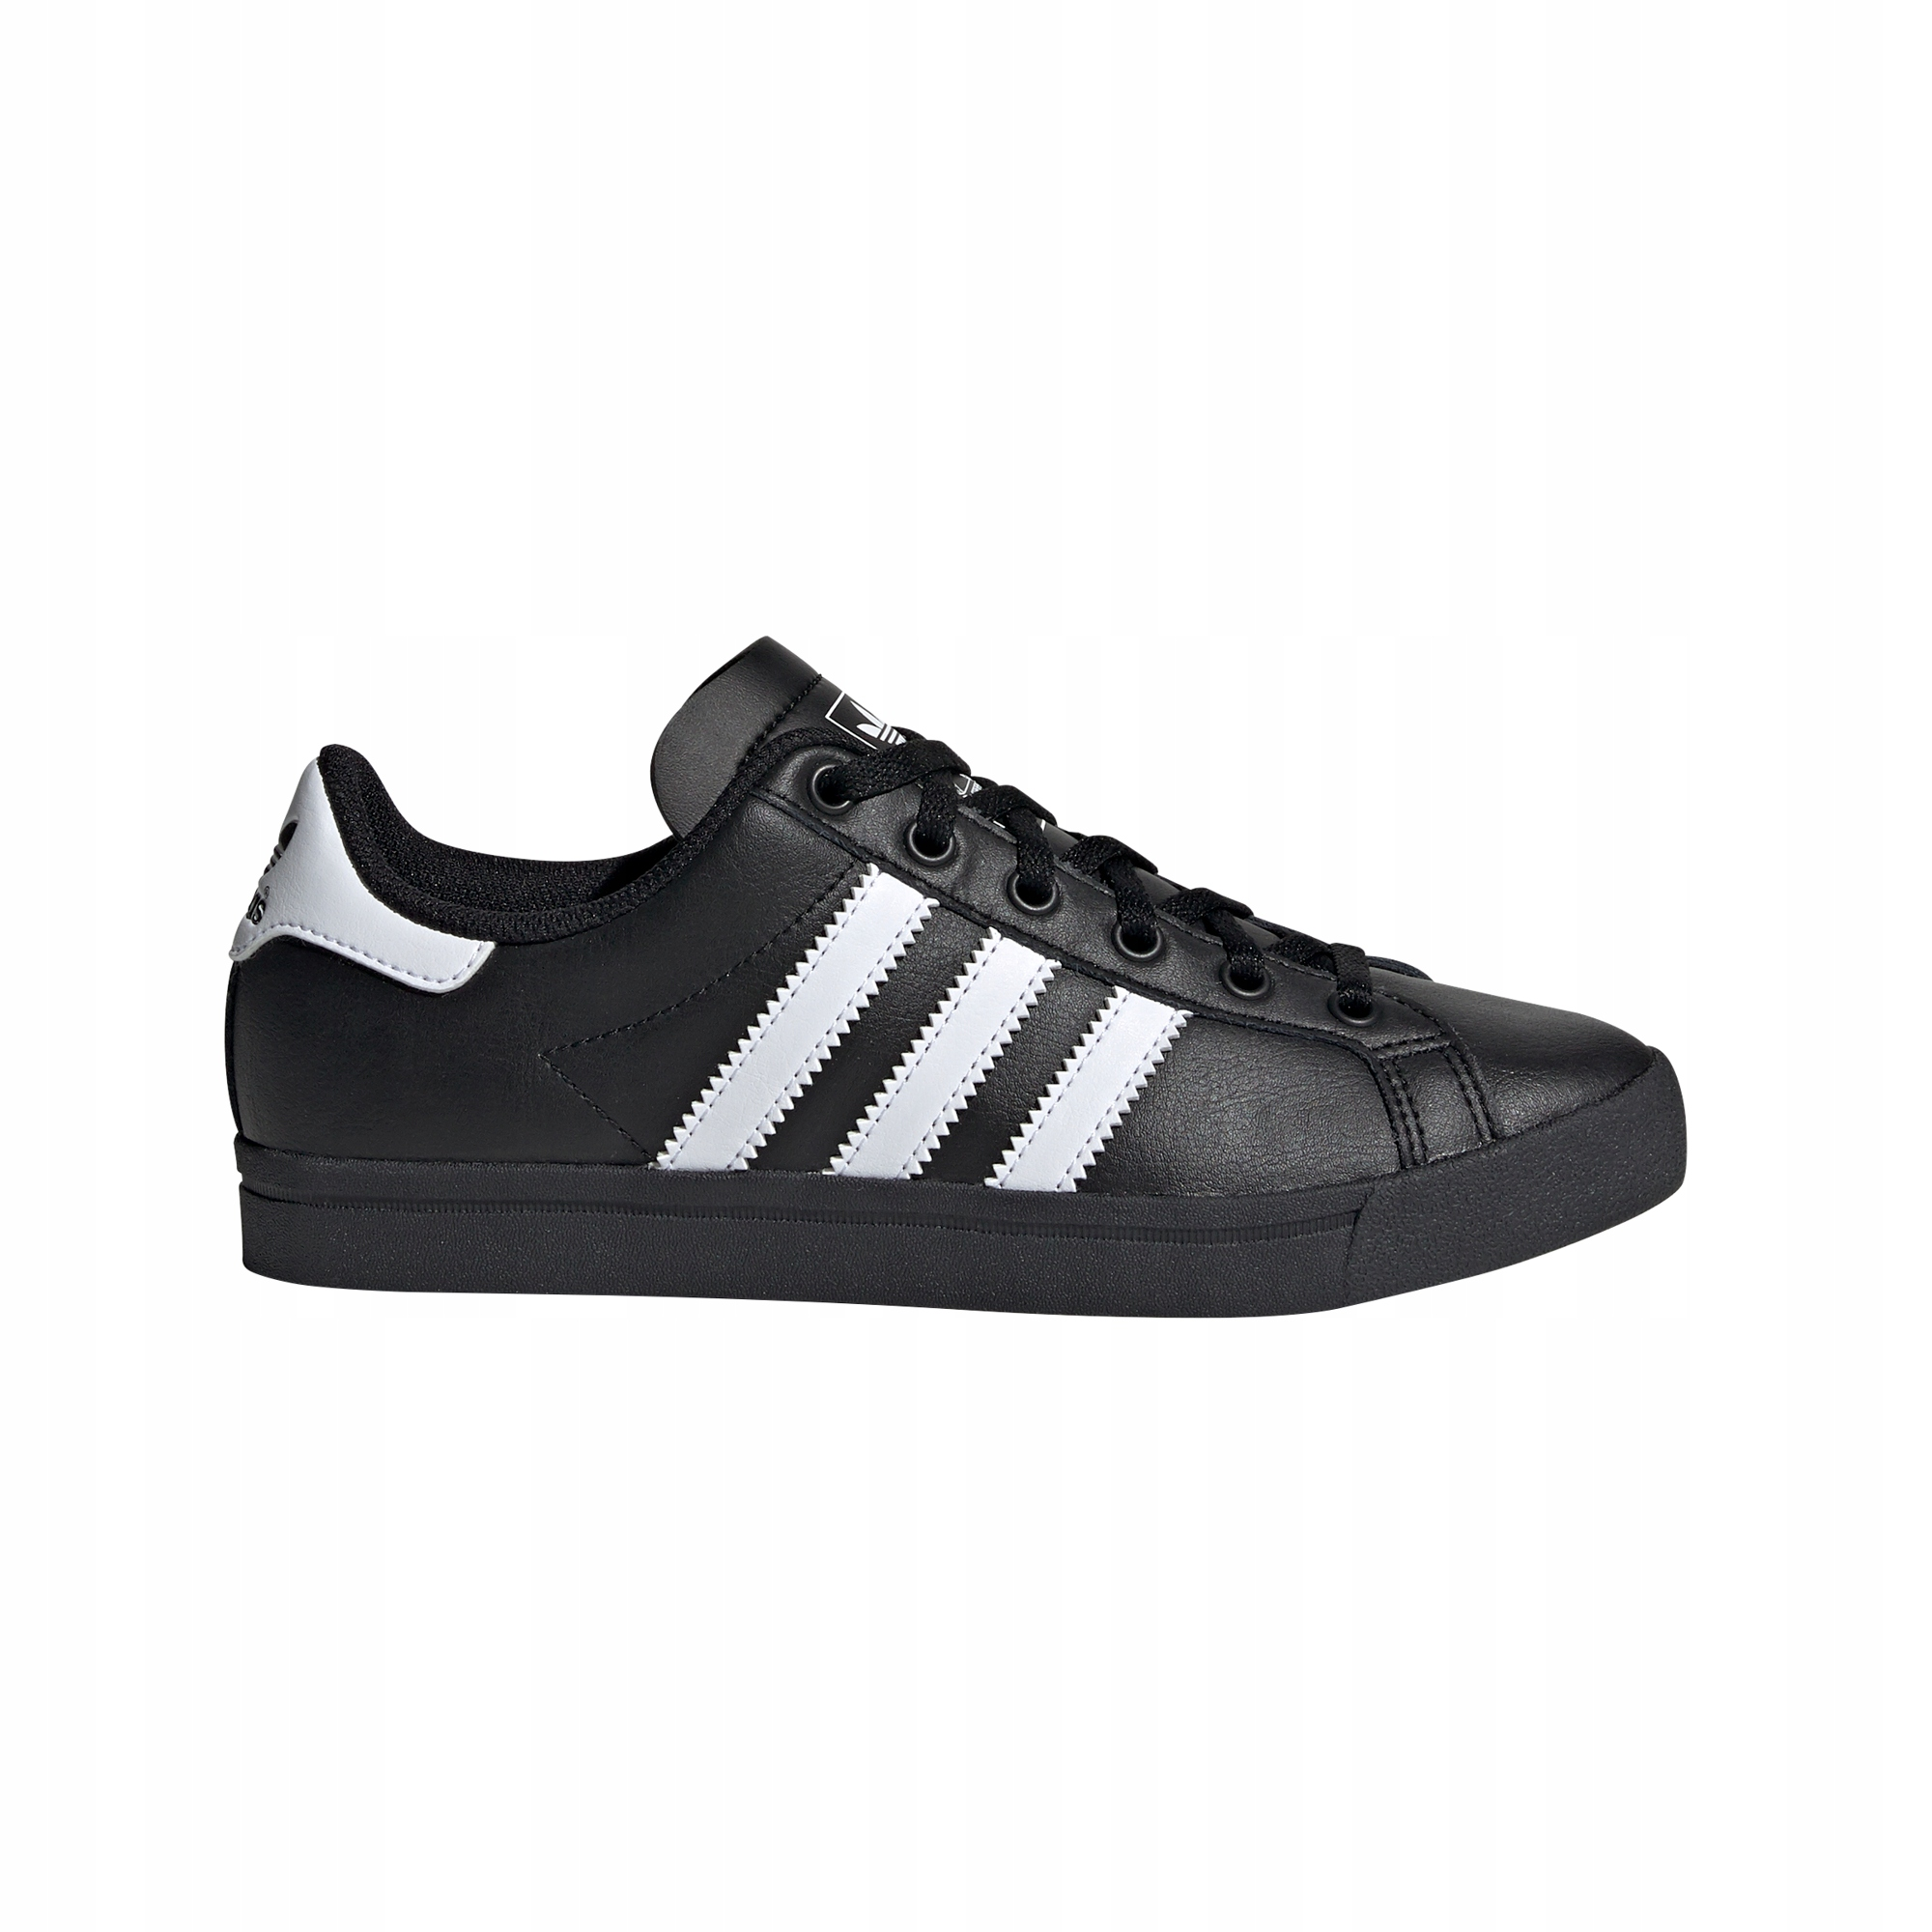 buty adidas Coast Star J r 36 23 EE9699